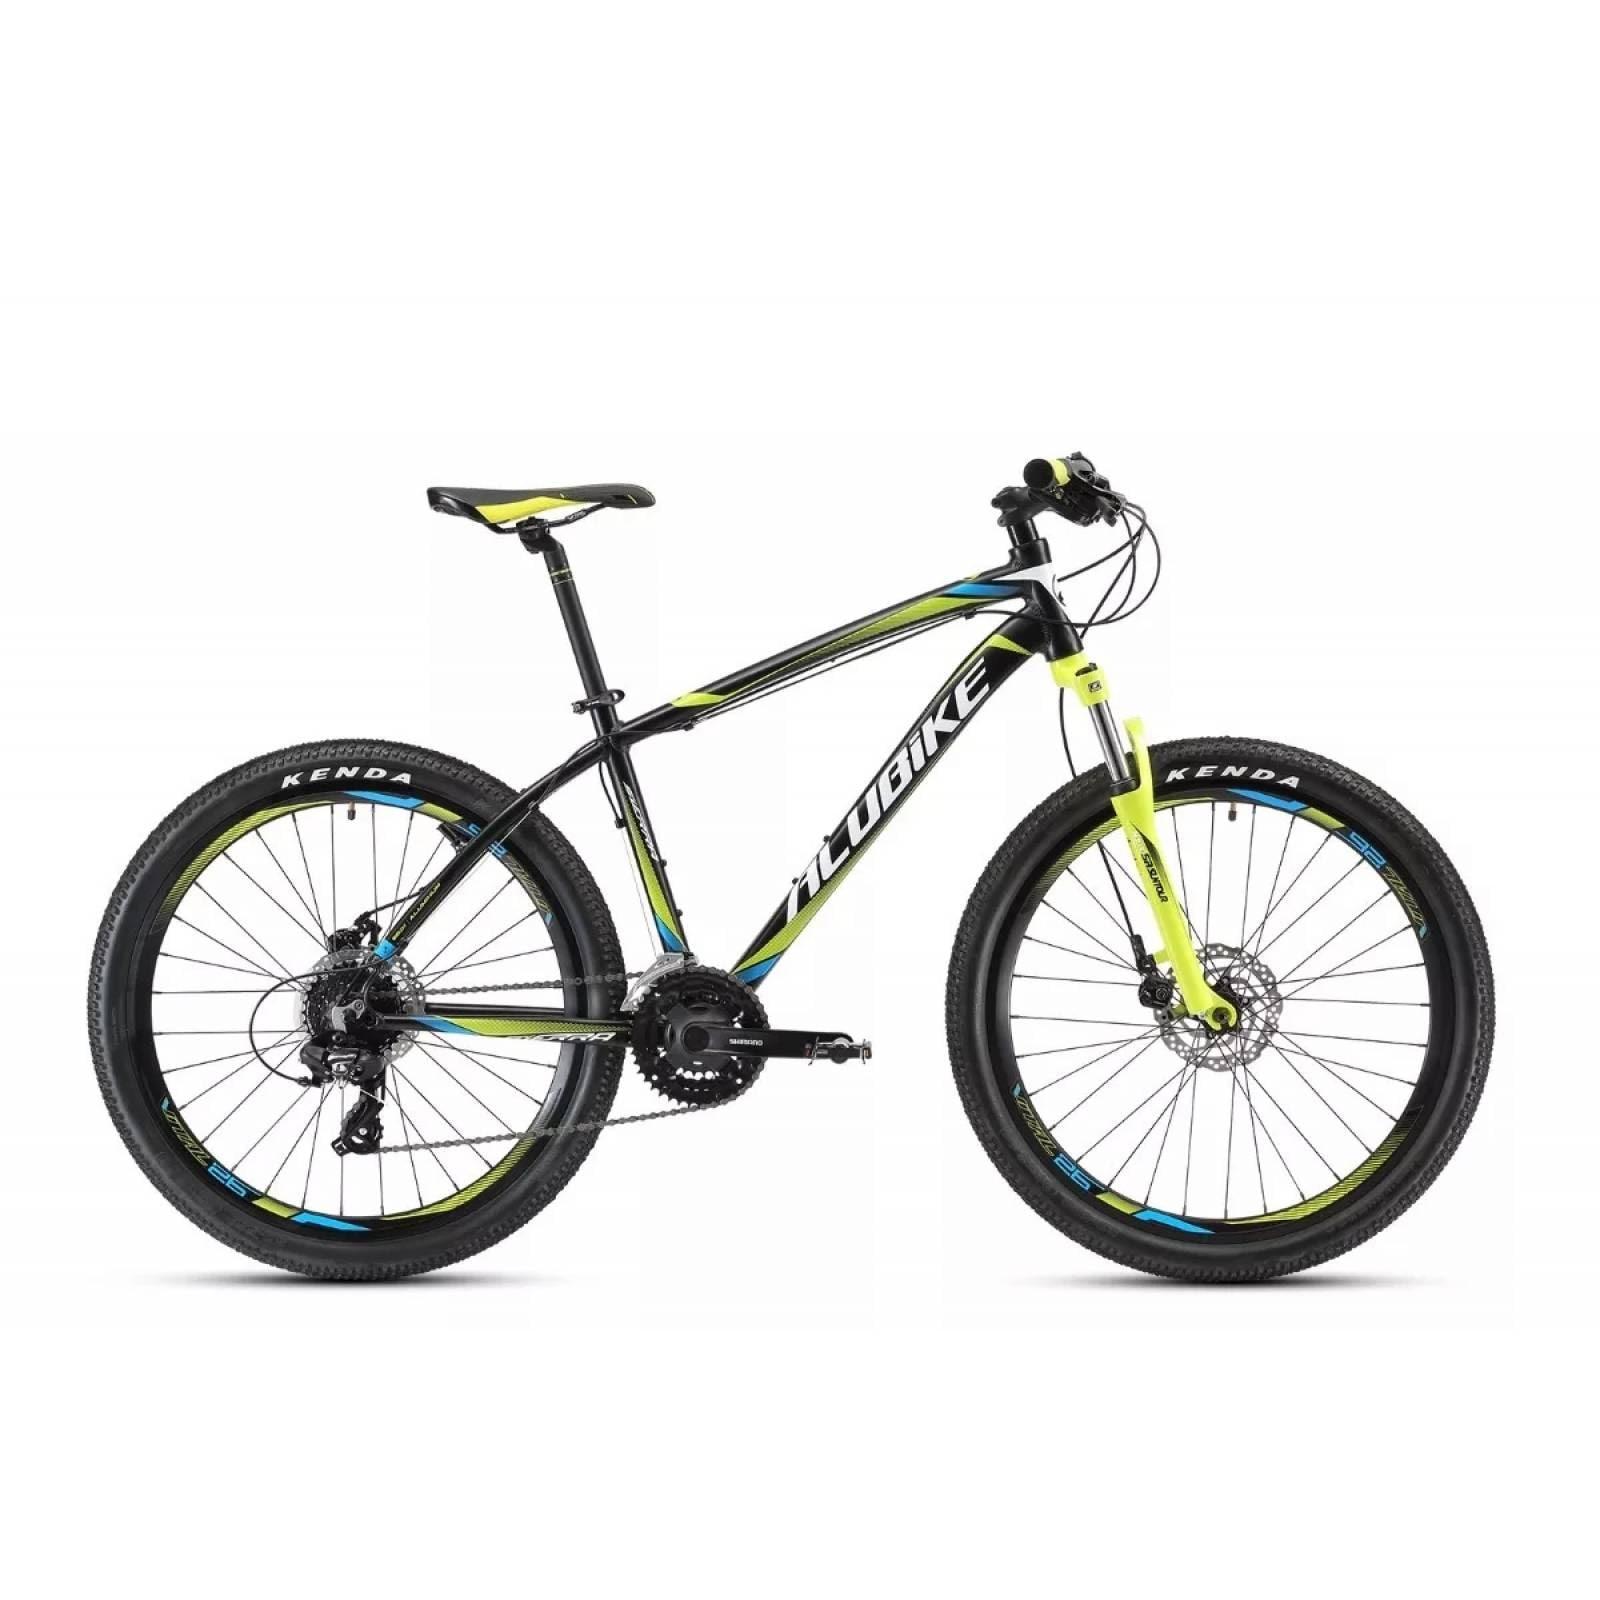 Bicicletas mtb presenta bicicleta-mtb-alubike-sierra-rodada-26-con-24-vel-mod